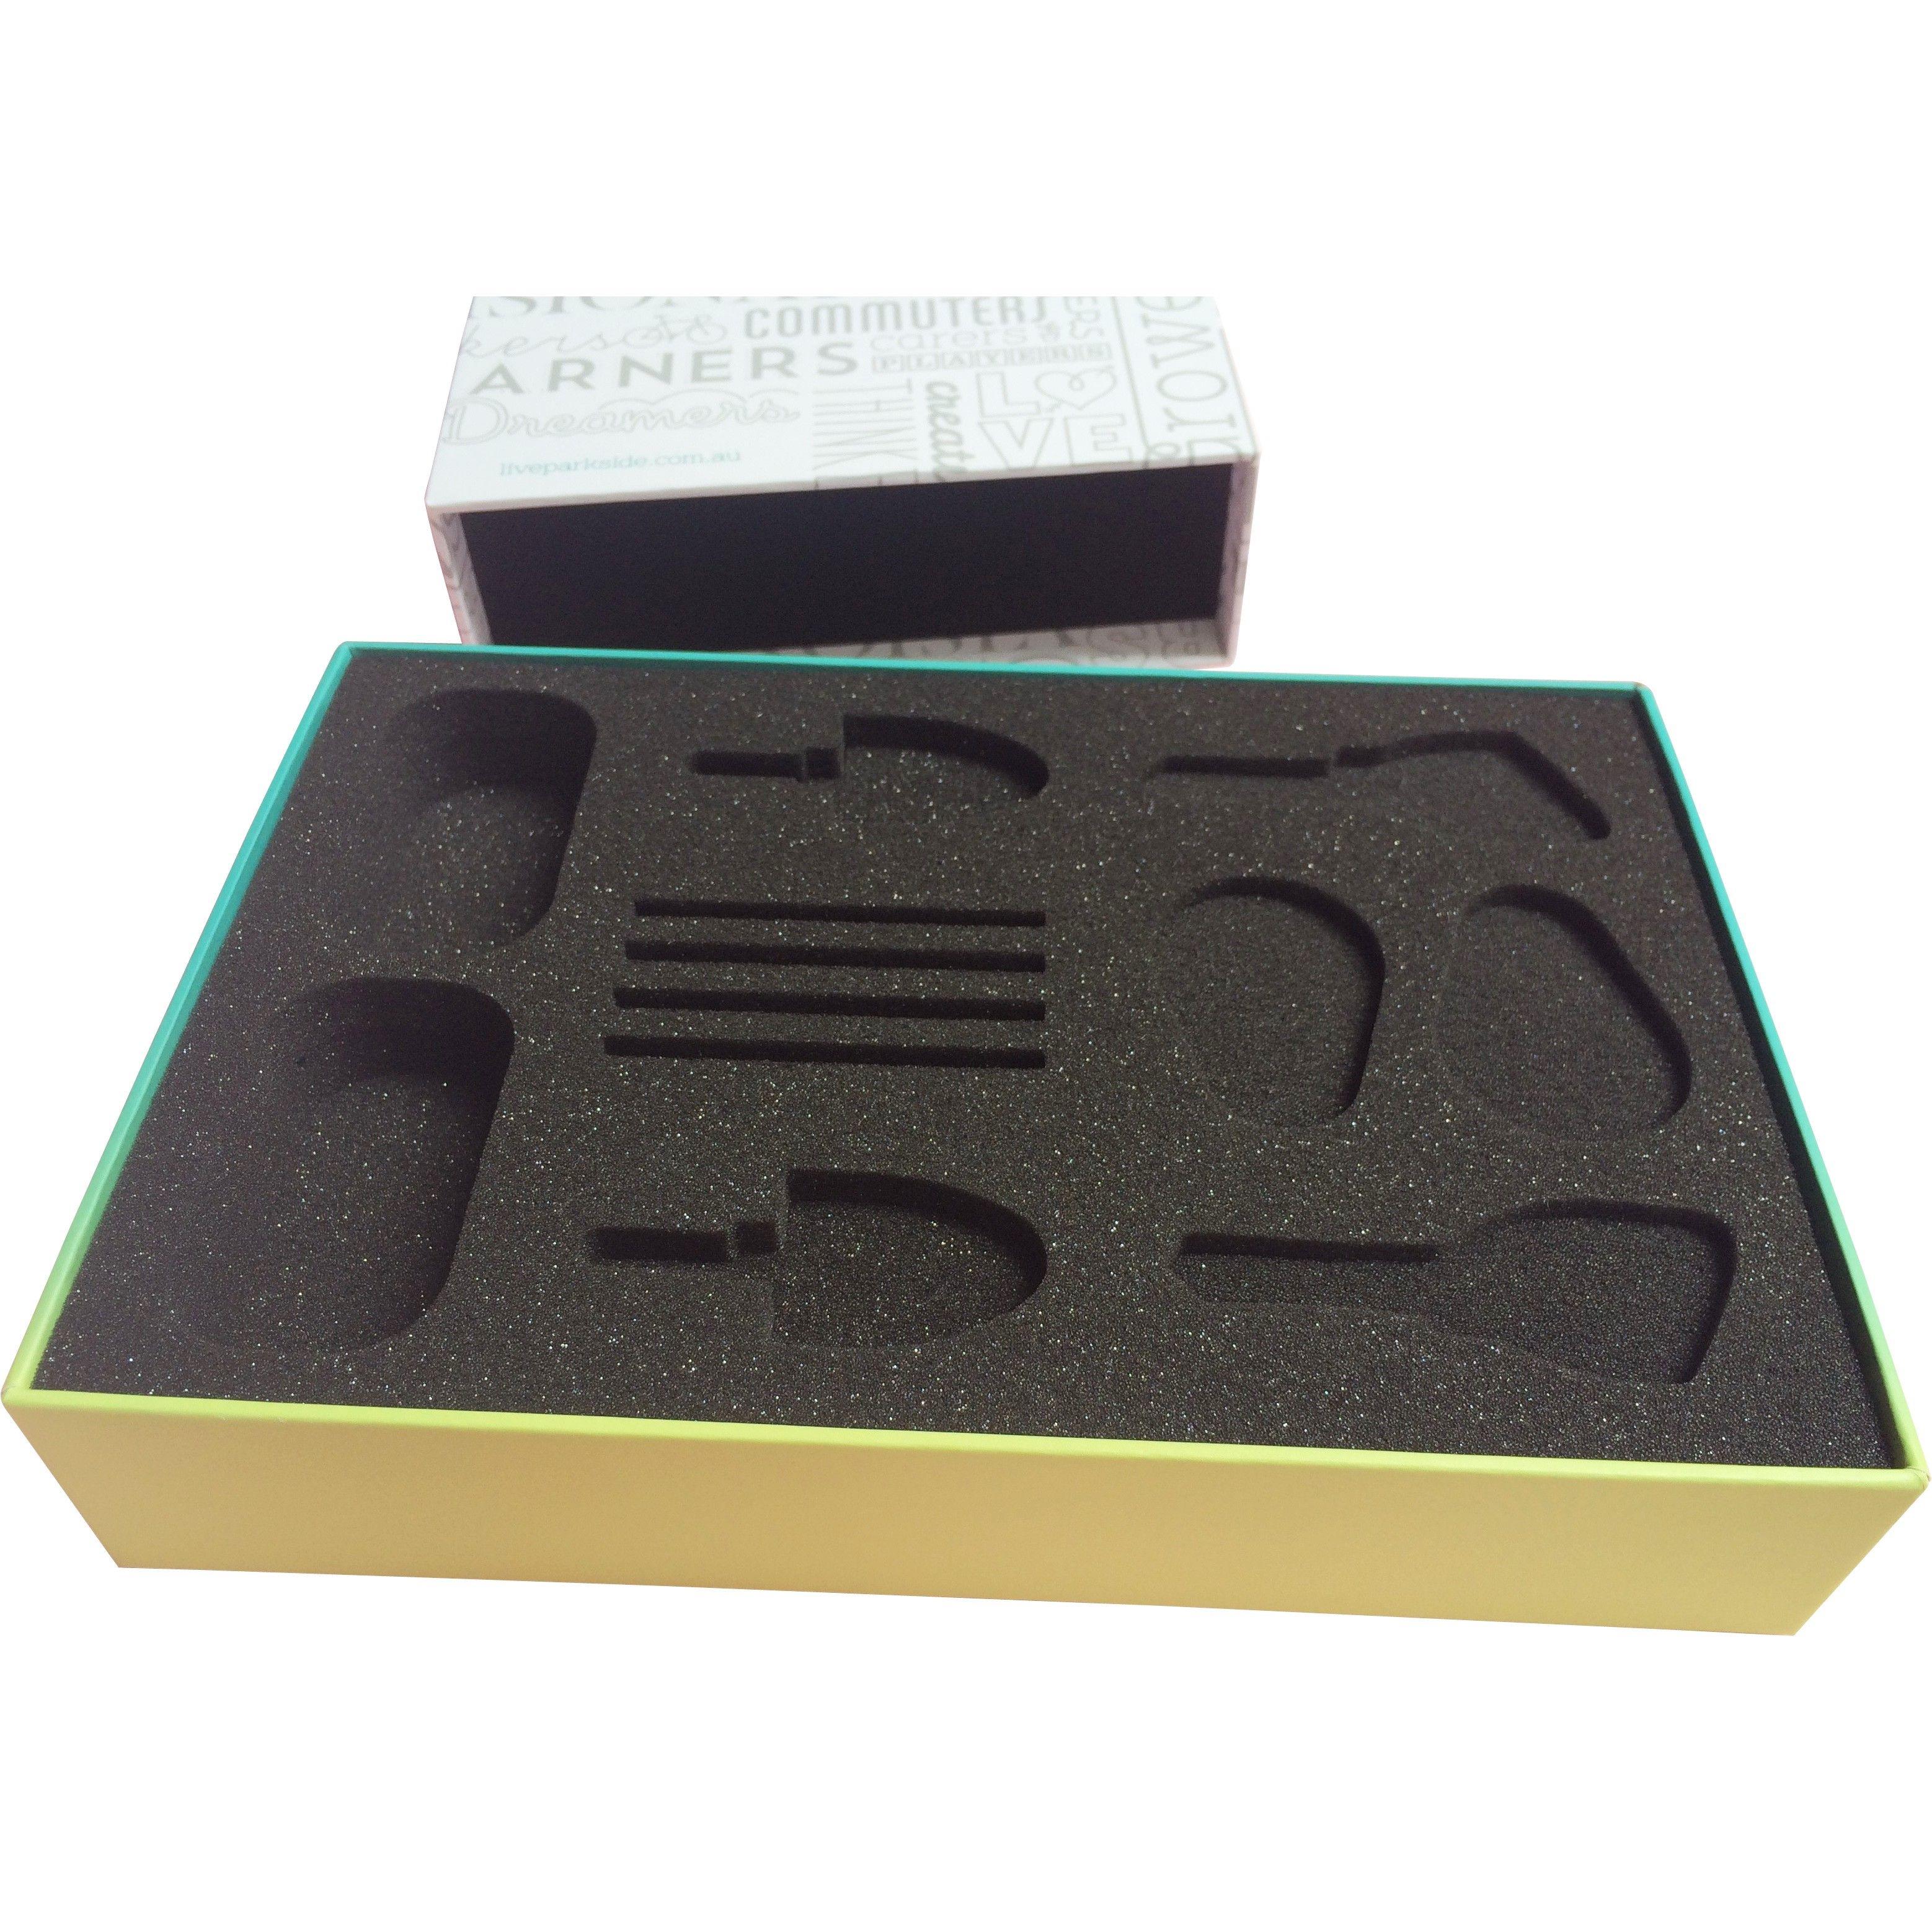 Rigid Box With Bespoke Foam Insert Handover Box Gift Box Custom Printed Boxes Custom Printed Bags Custom Boxes